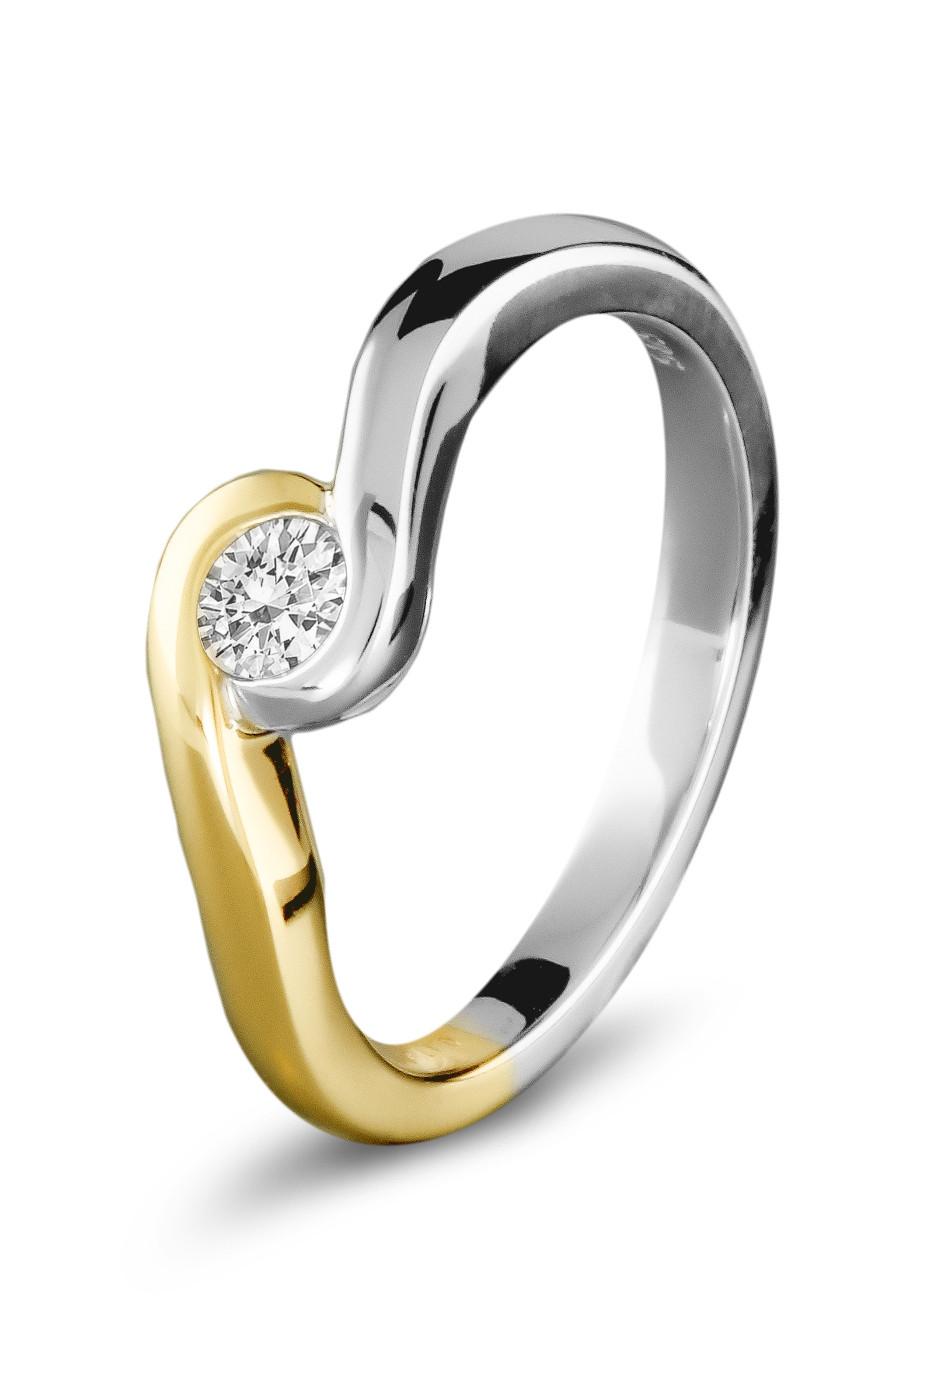 Gouden bicolor ring 0,24crt SOL-M945-025-G2